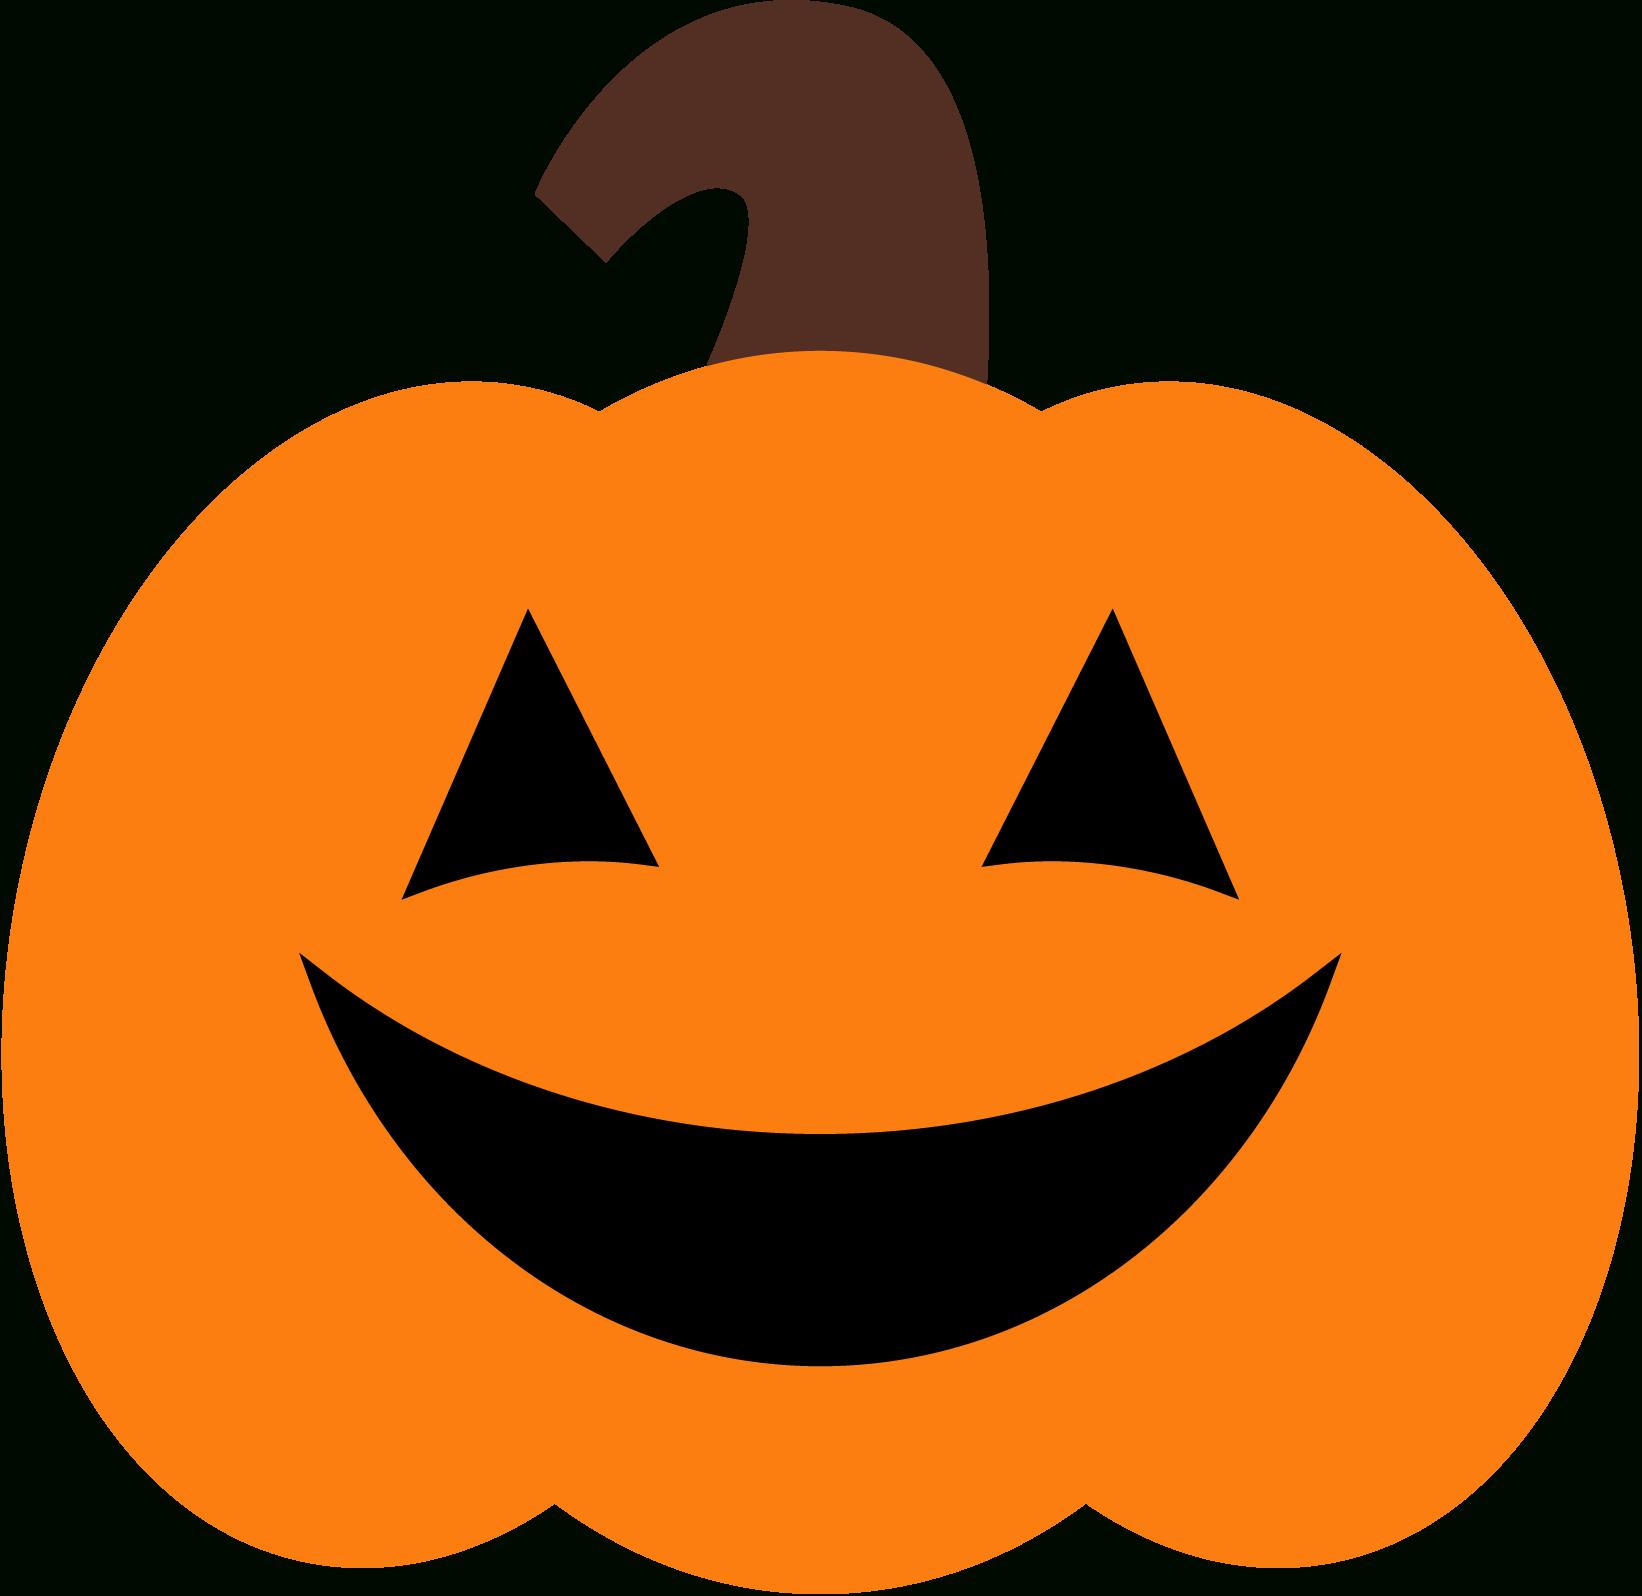 free printable pumpkin clipart at getdrawings com free for rh getdrawings com cute pumpkin face clipart cute halloween pumpkin clipart